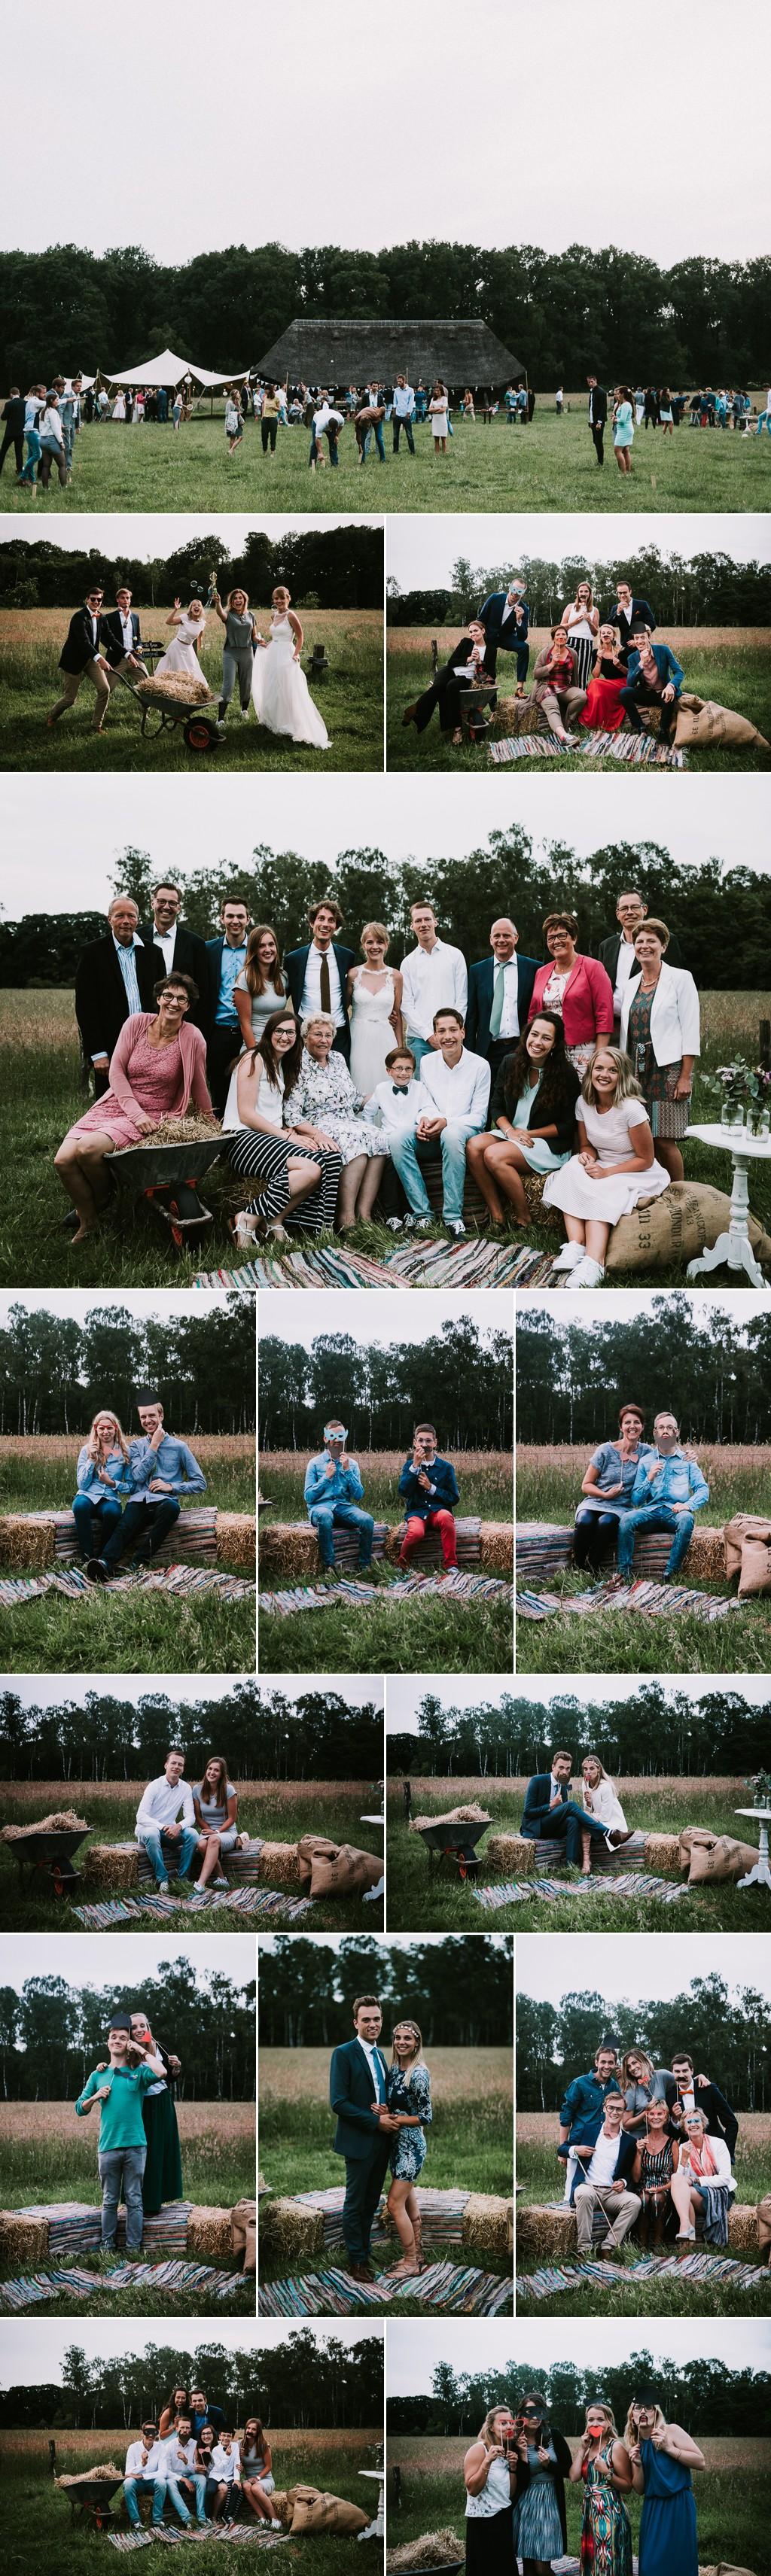 trouwfotograaf-rotterdam-trouwen-in-het-bos-arnhem-fotografie-steef-utama-w-w-13